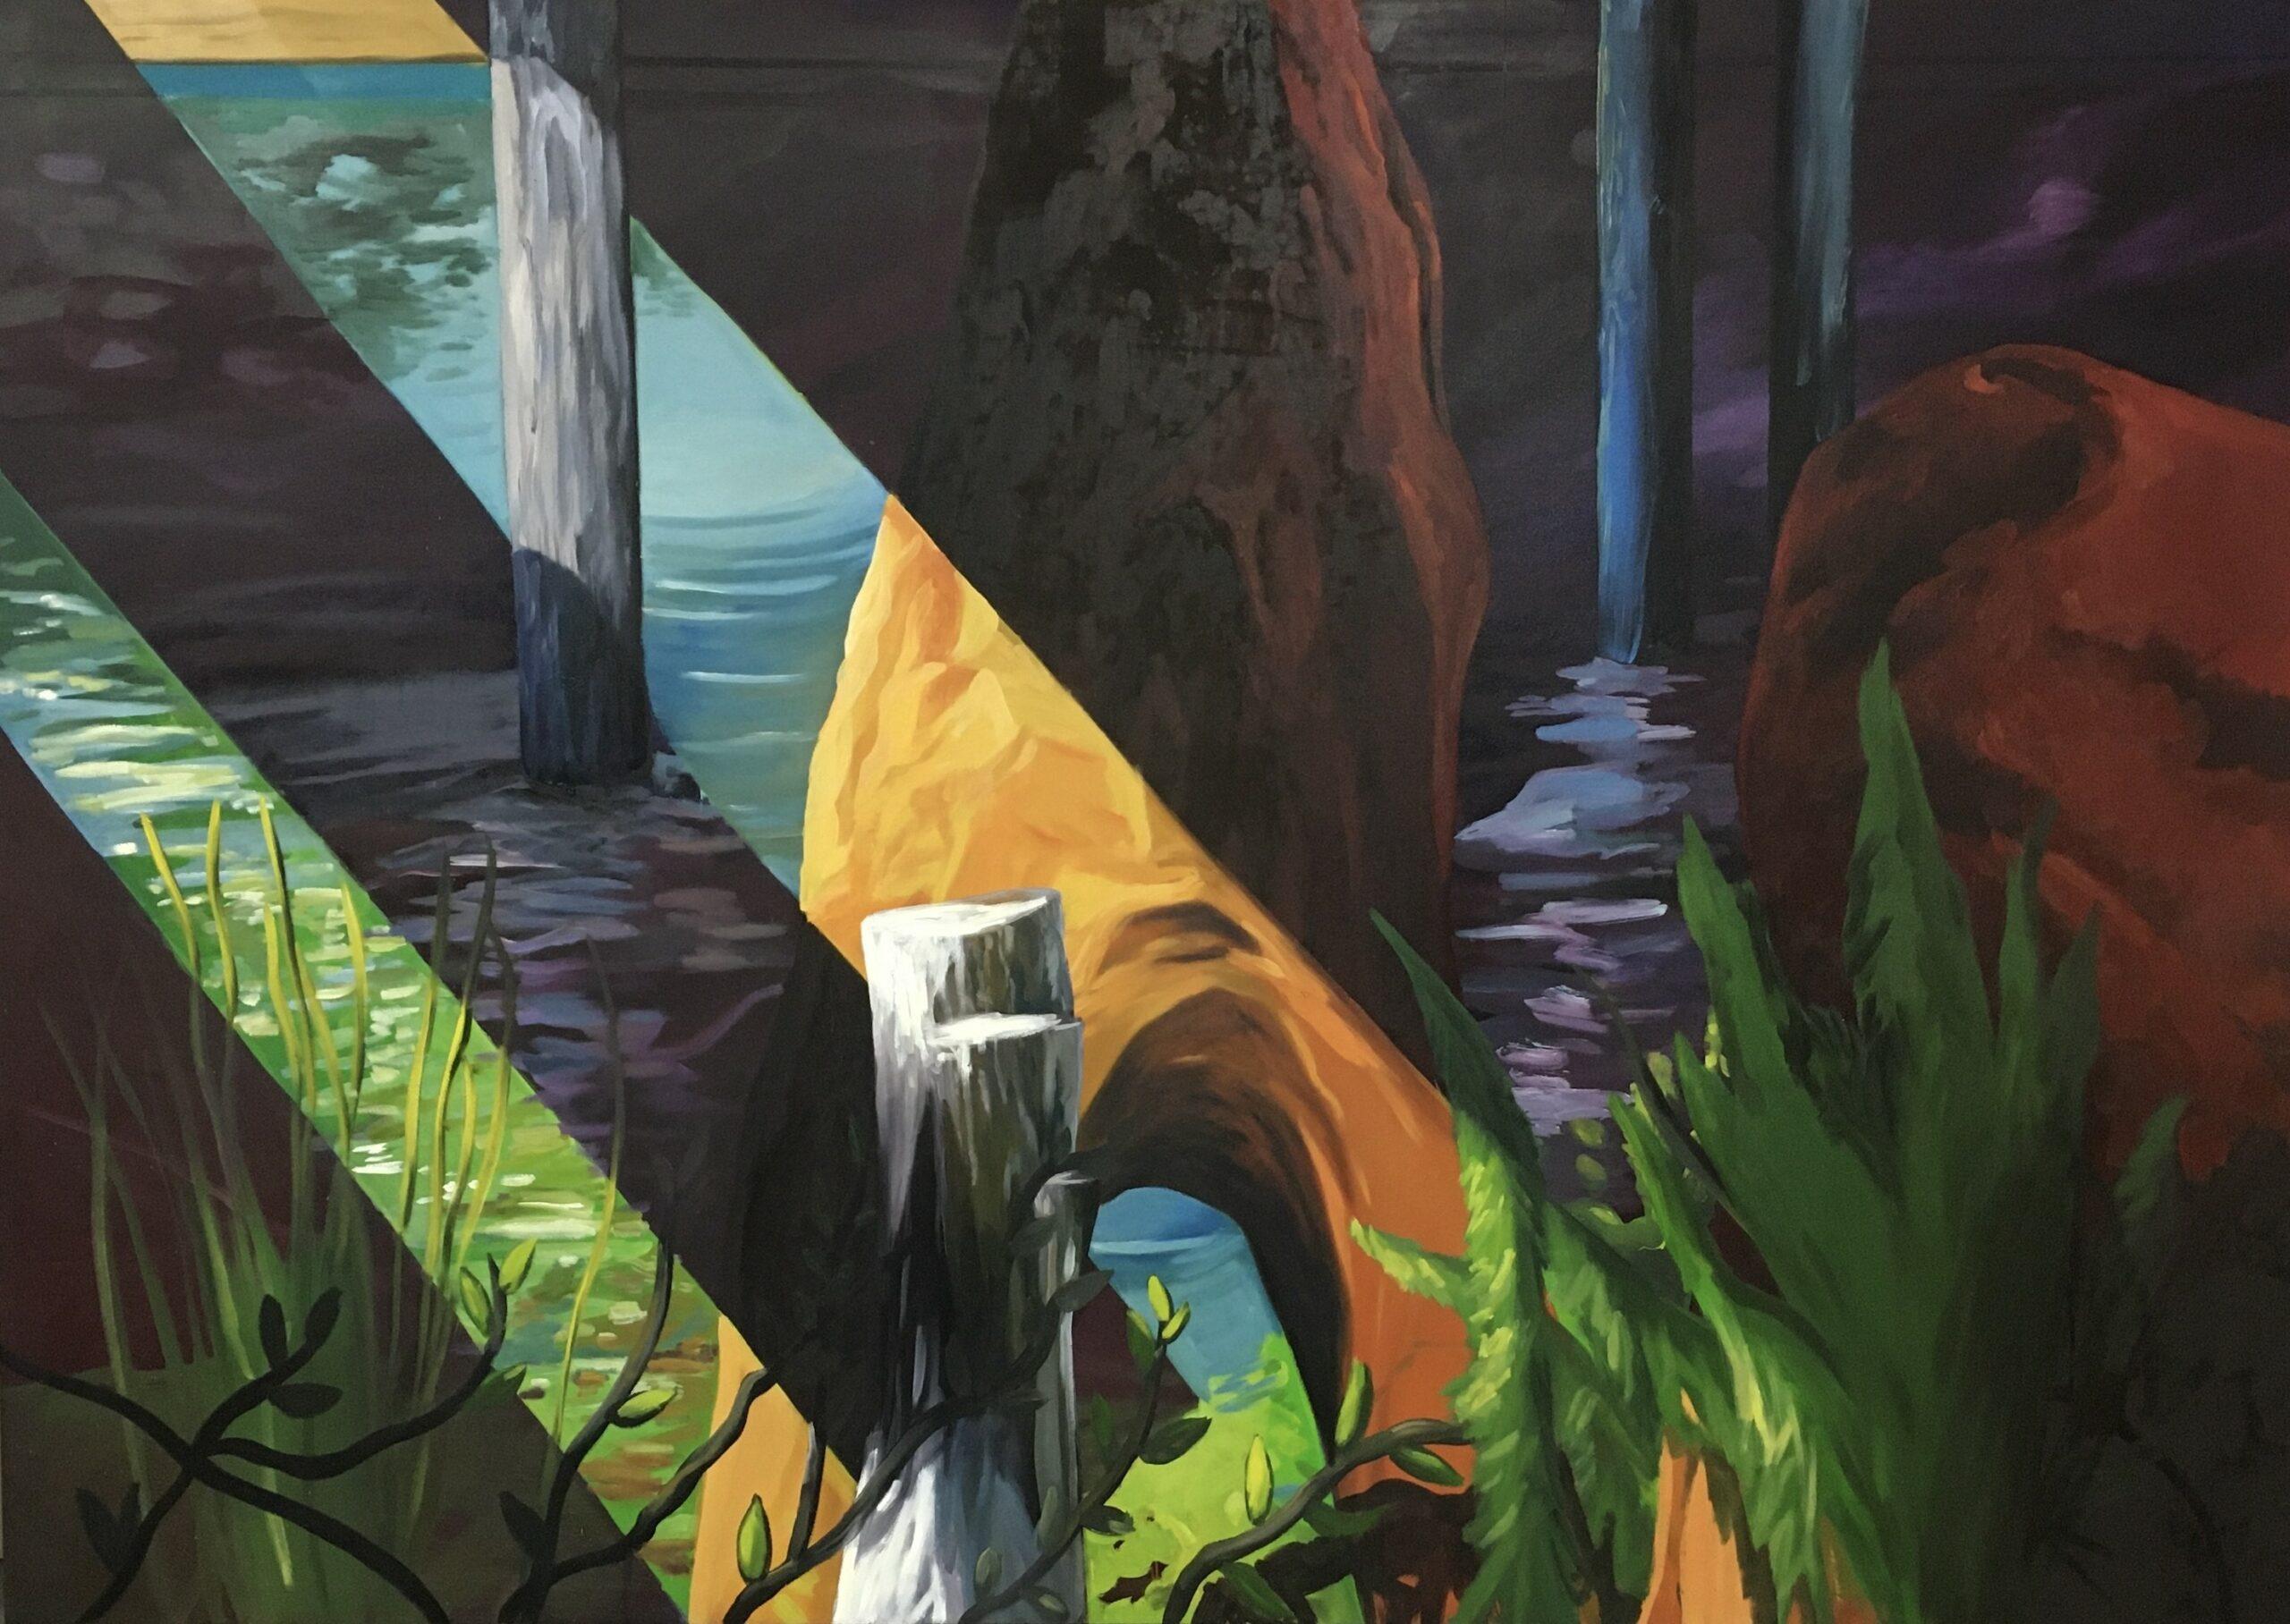 Ernesto Gutierrez Moya, The Pond (panel 2 of 6), 2020